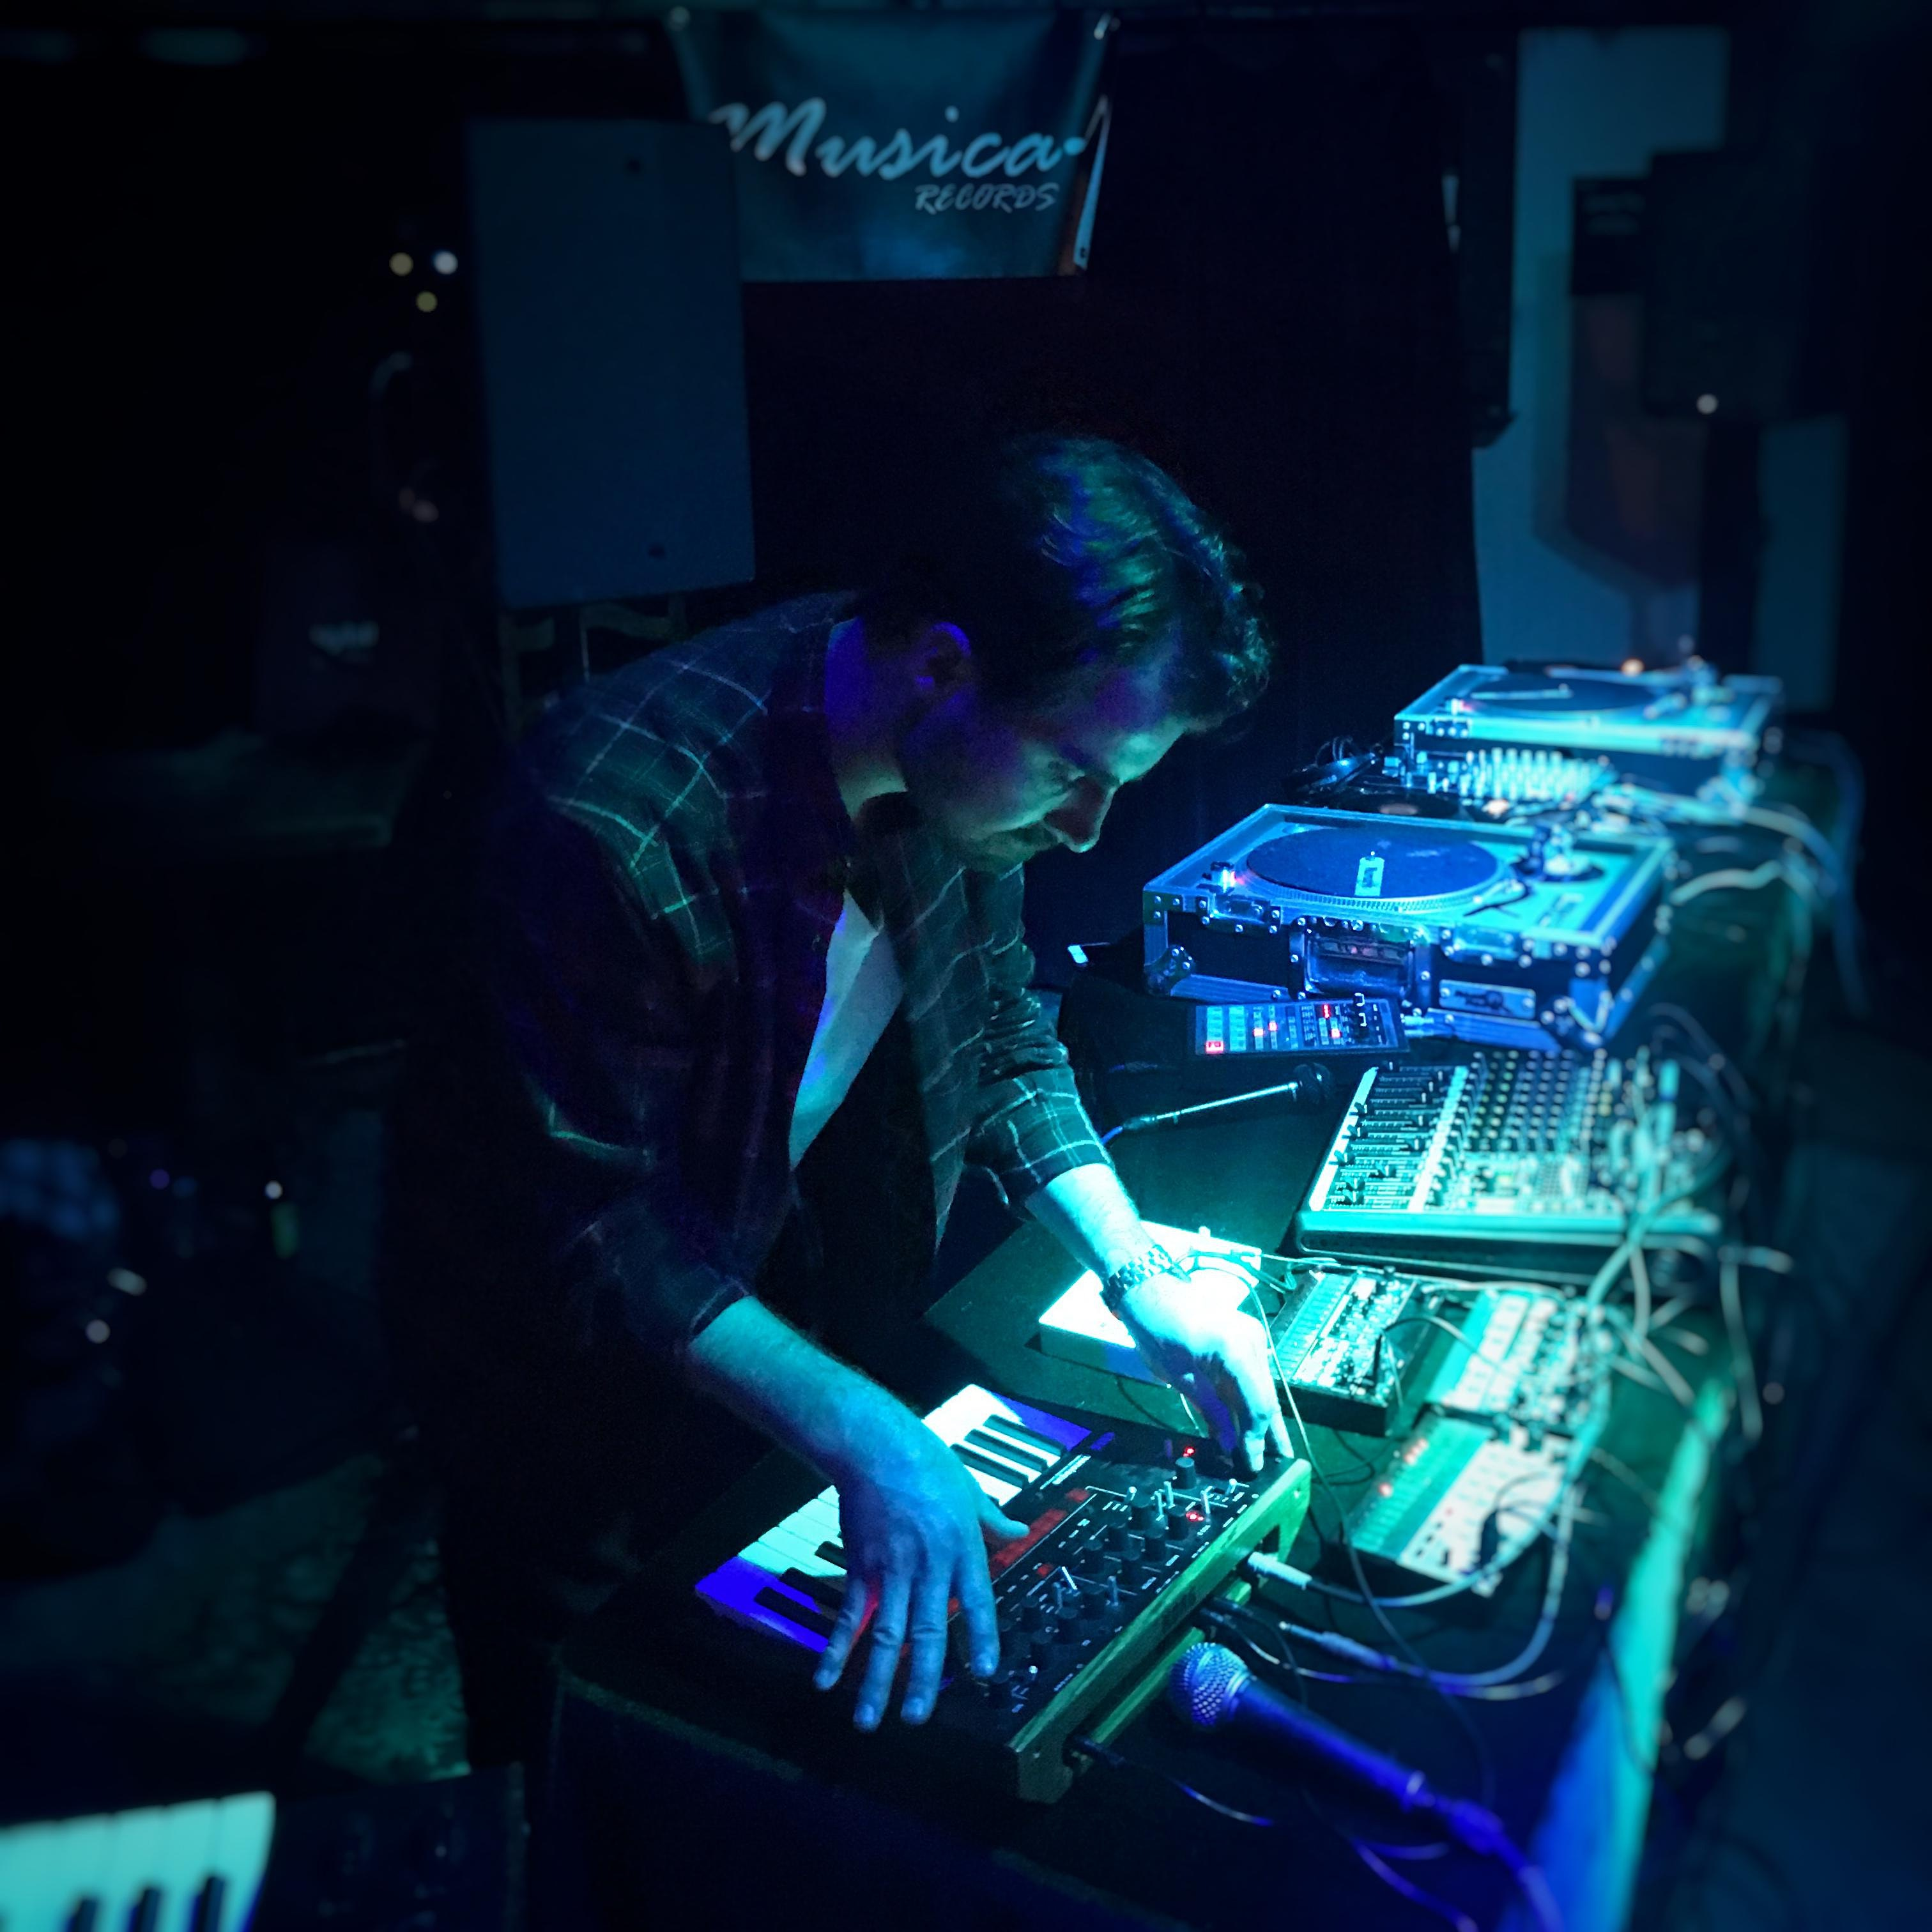 Musica Records House Afro Soul DJ Showcase